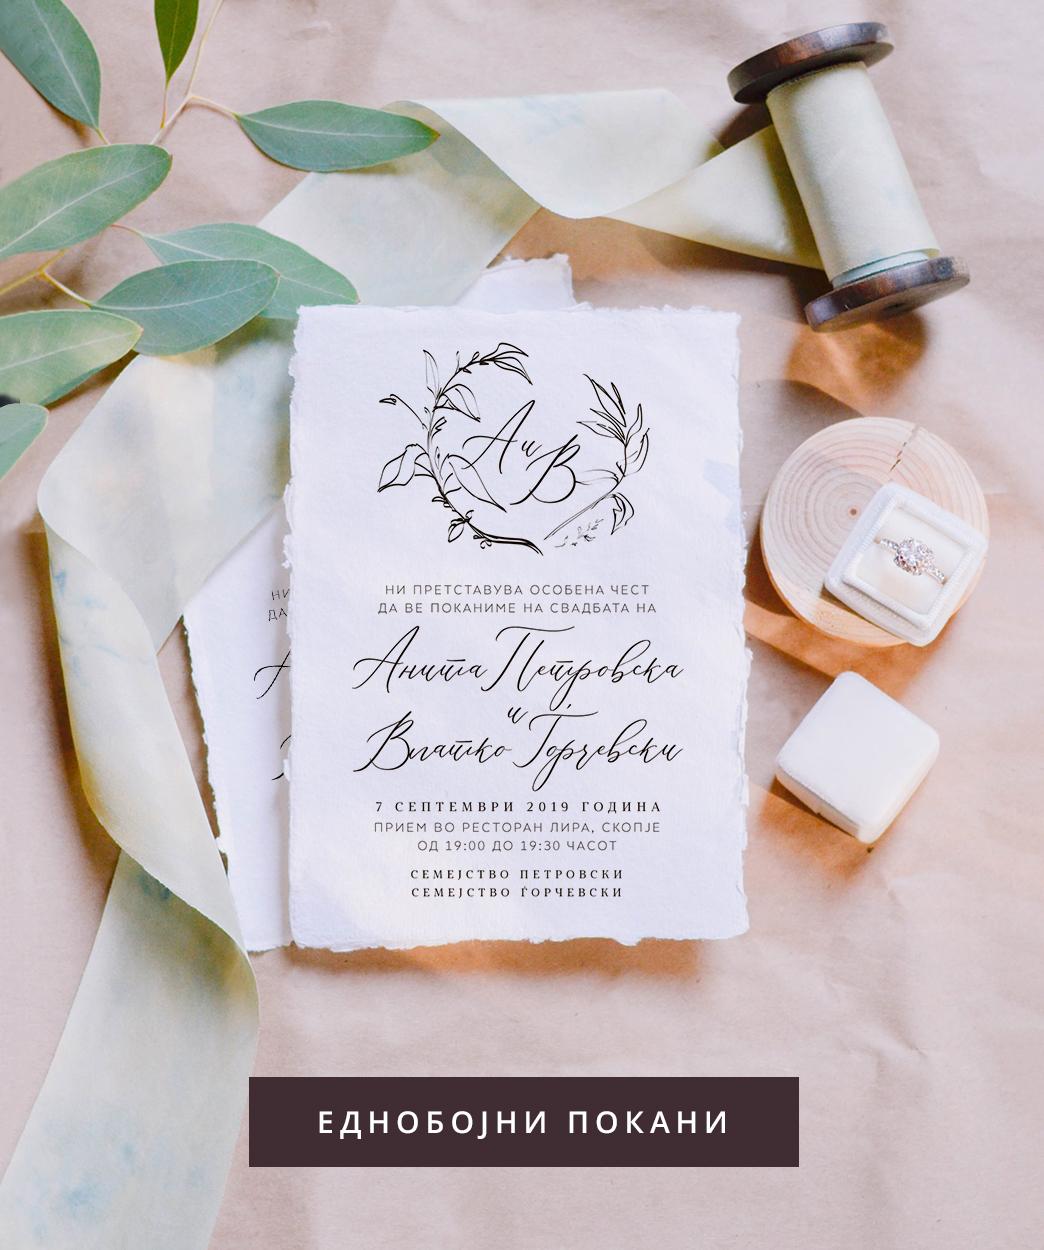 pokani za svadba покани за свадба